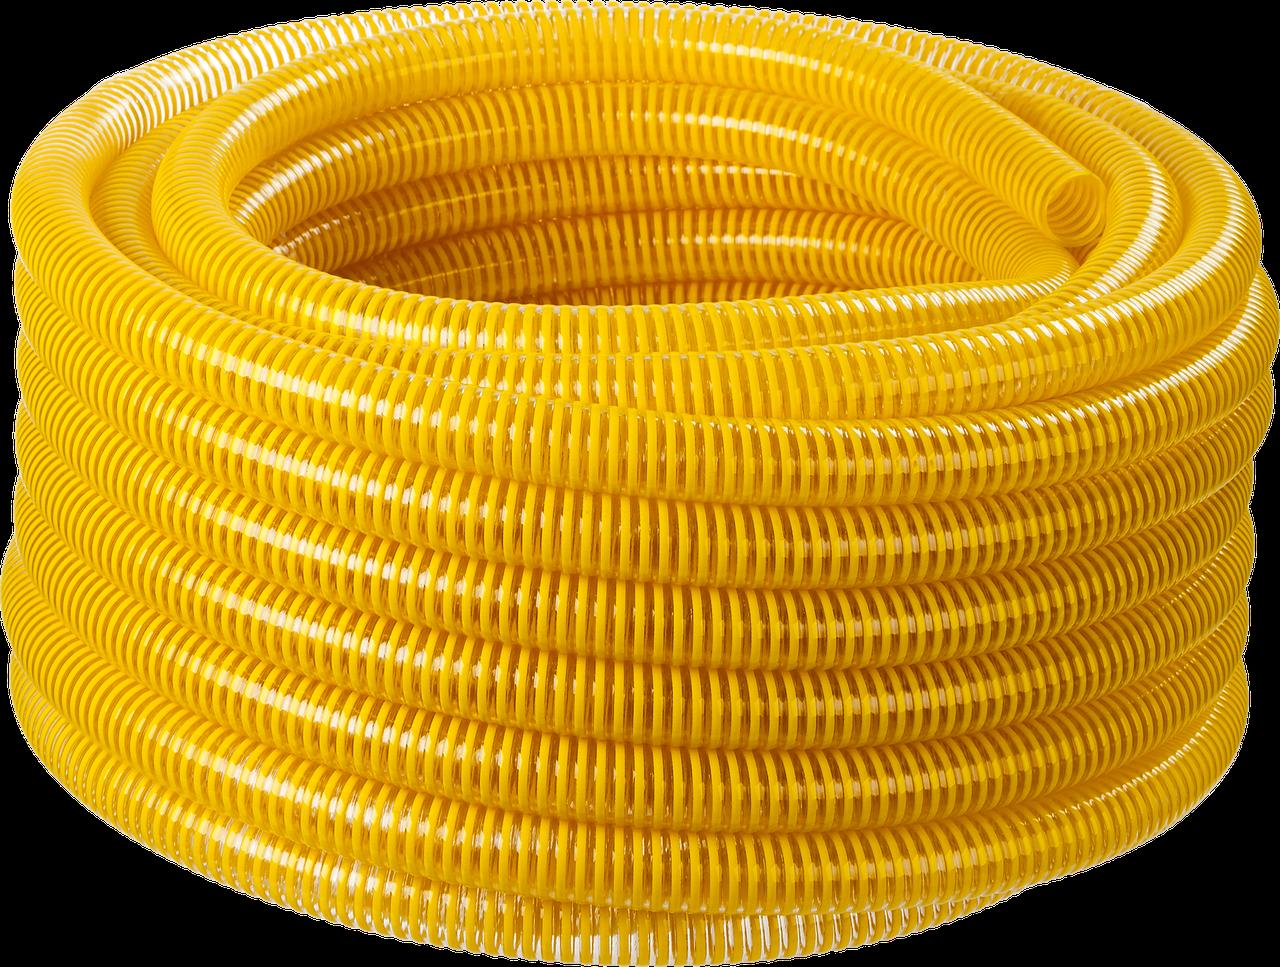 ЗУБР Шланг напорно-всасывающий со спиралью ПВХ, 10 атм, 19мм х 15м 200, 19, 30